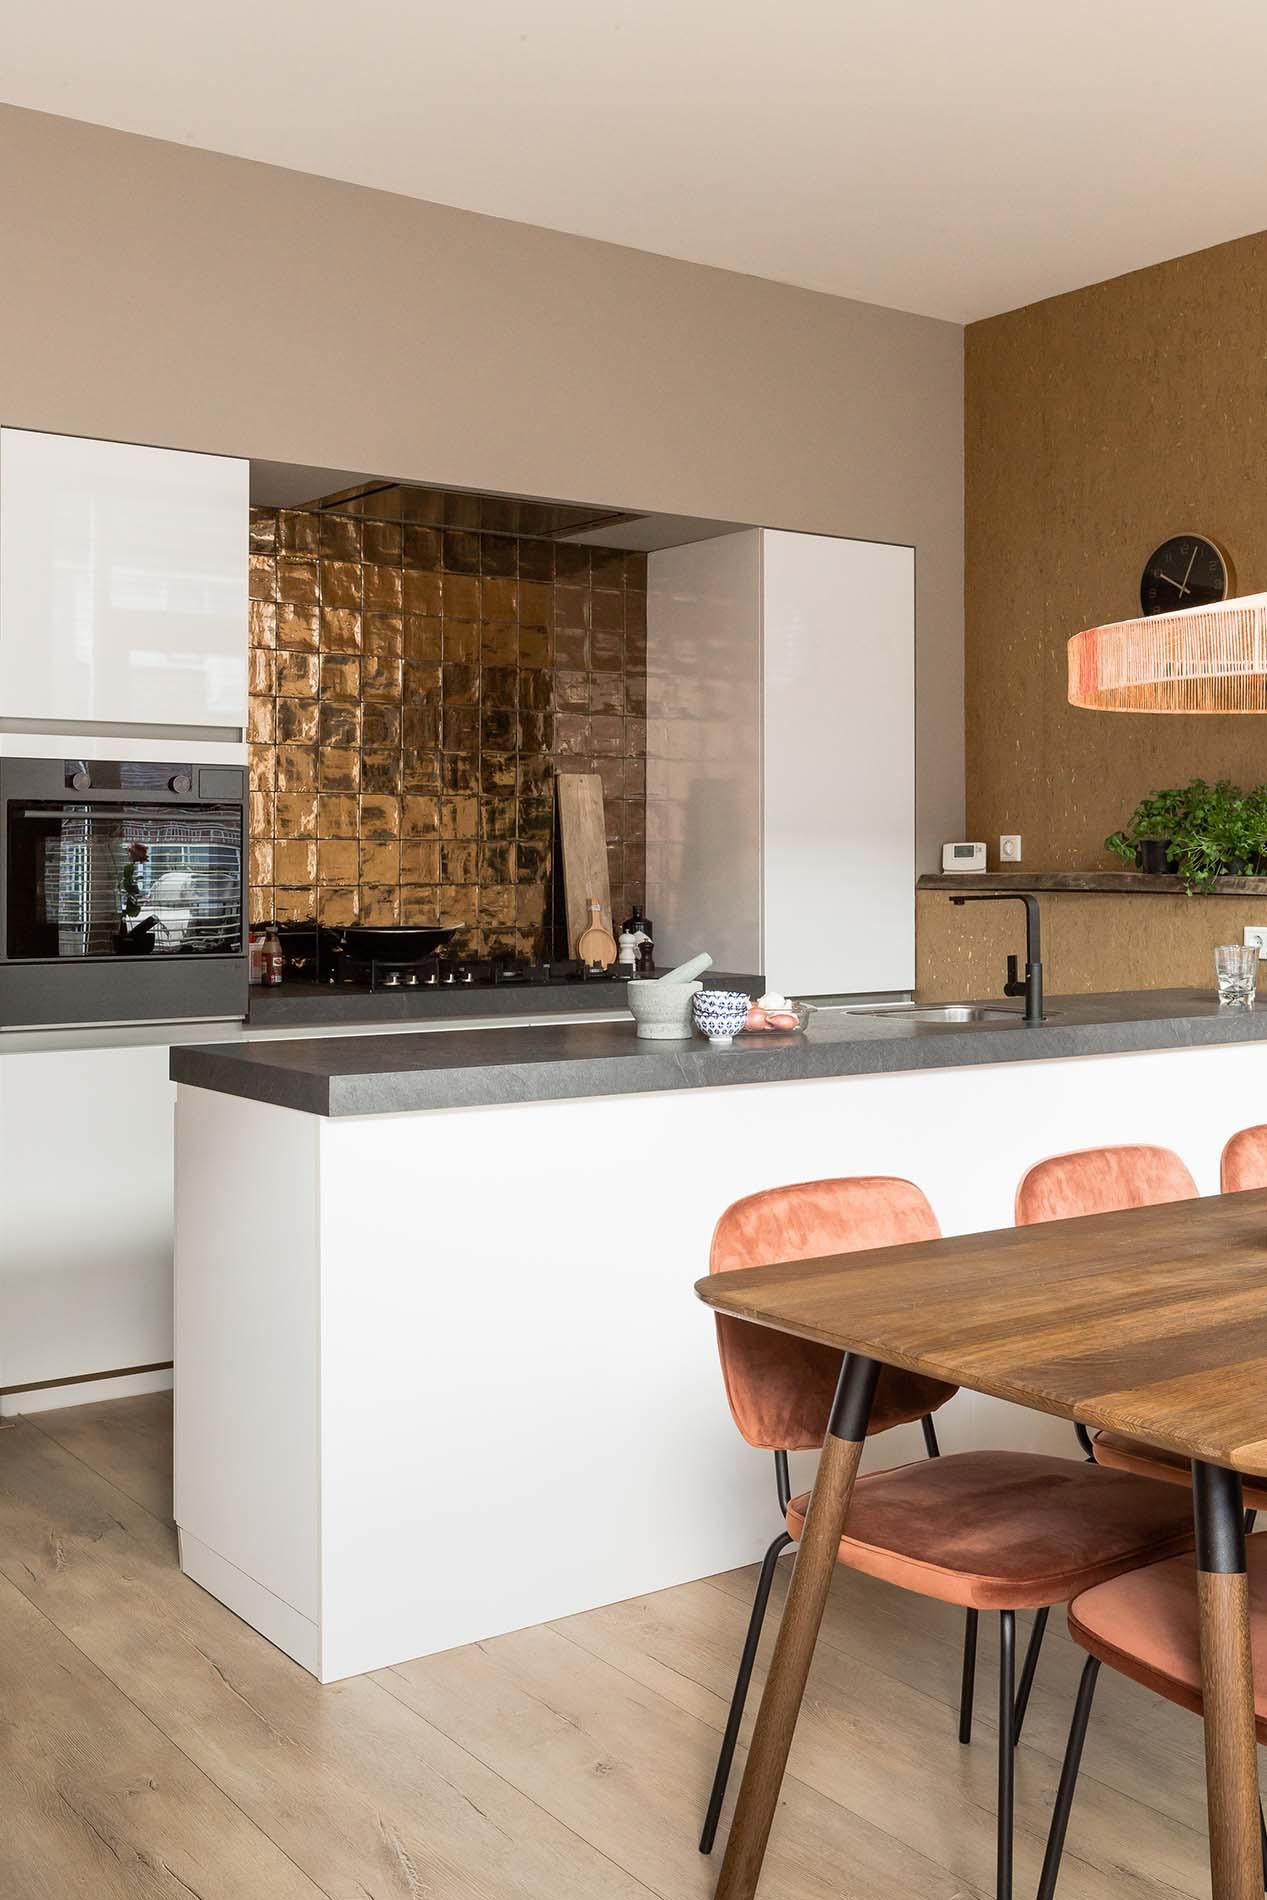 vtwonen keuken met ATAG apparatuur, keukeninspiratie ASWA Keukens